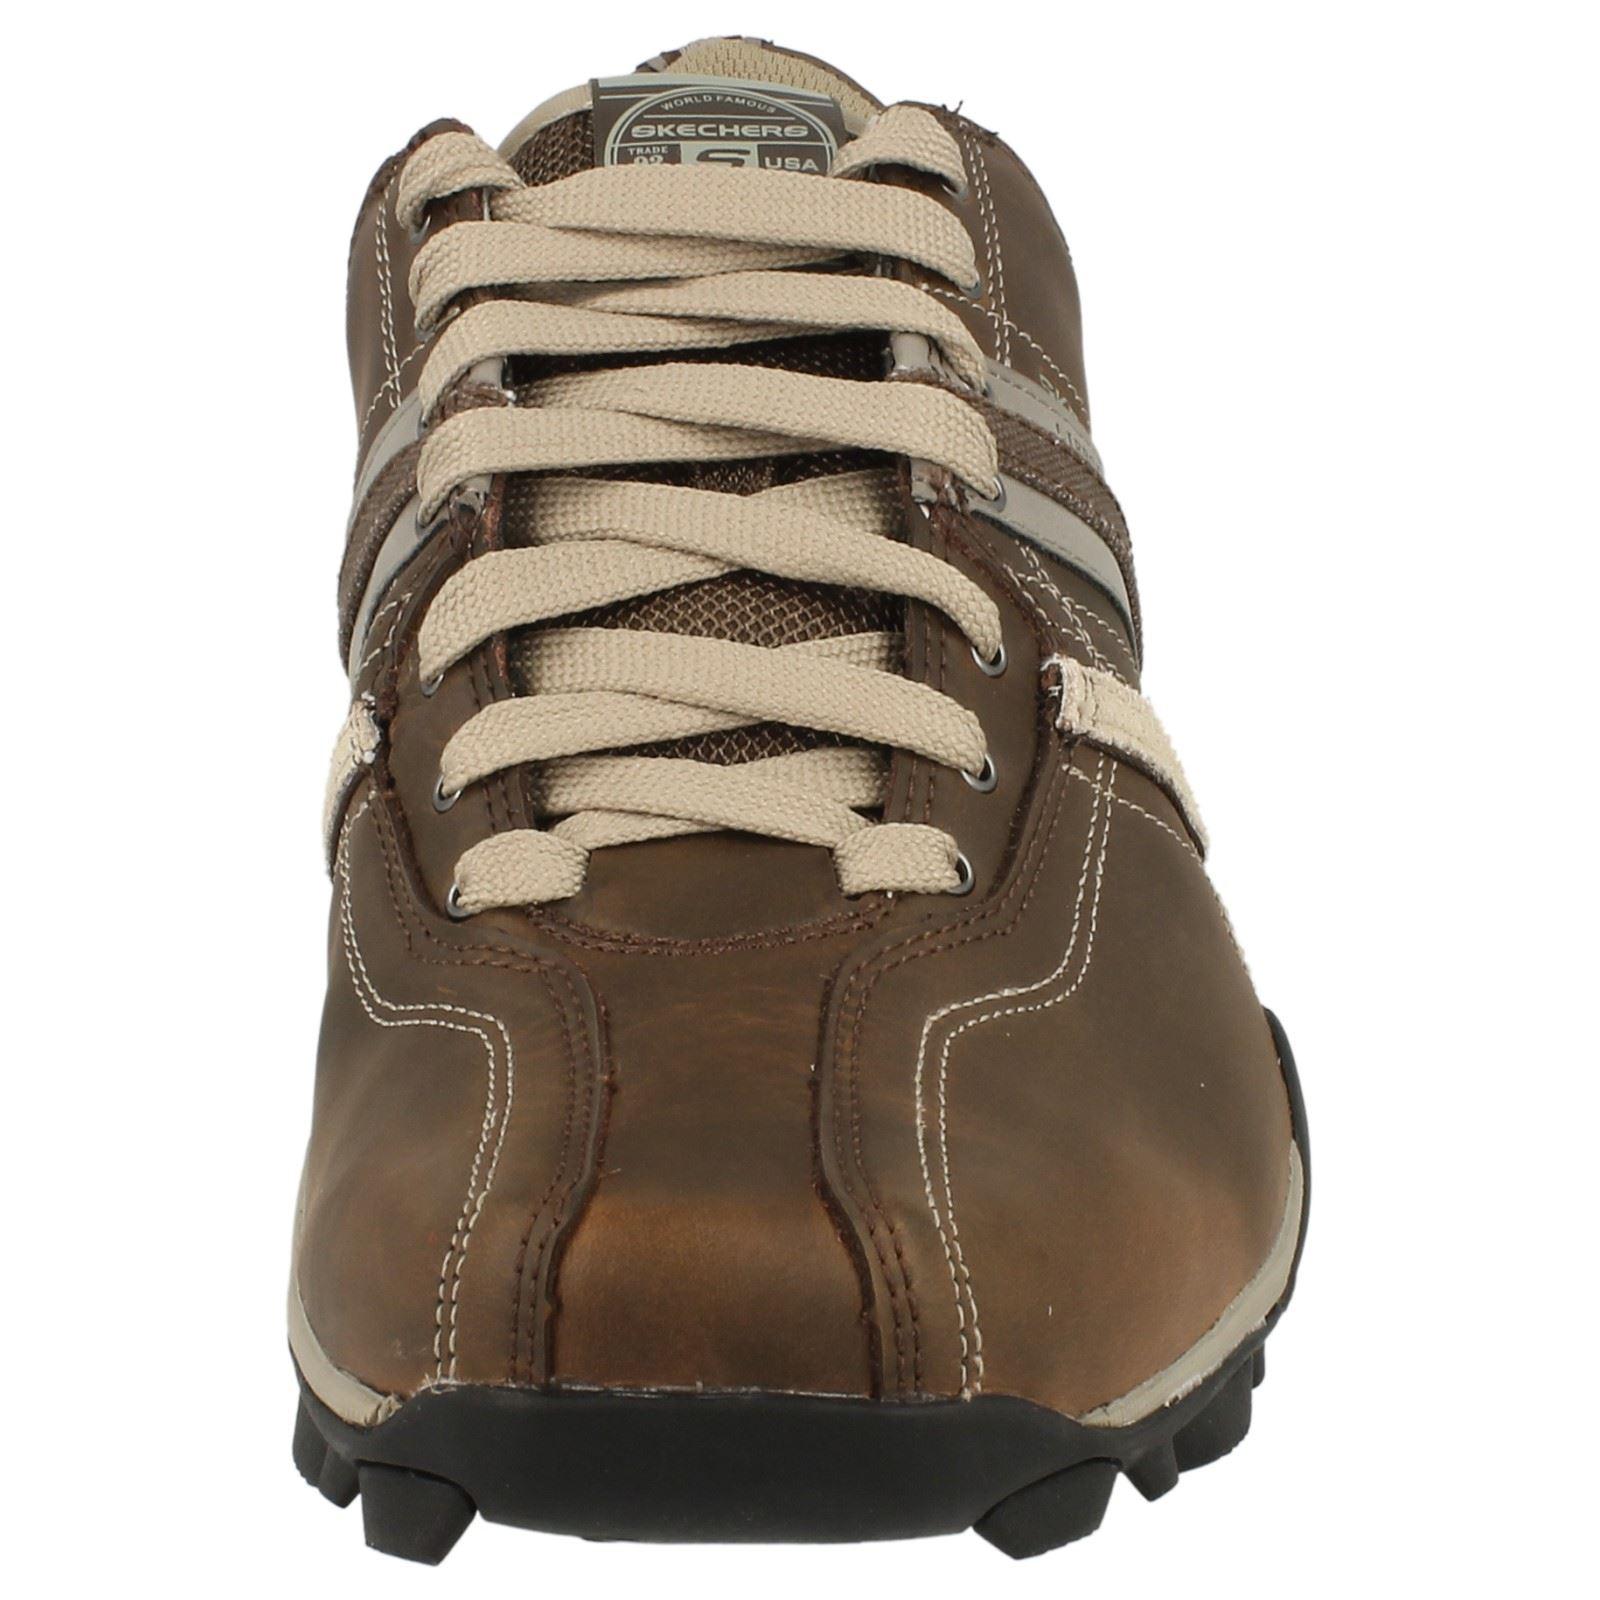 Uomo Skechers Urban  Casual Leder Schuhes Urban Skechers Tread Refresh 348ab1